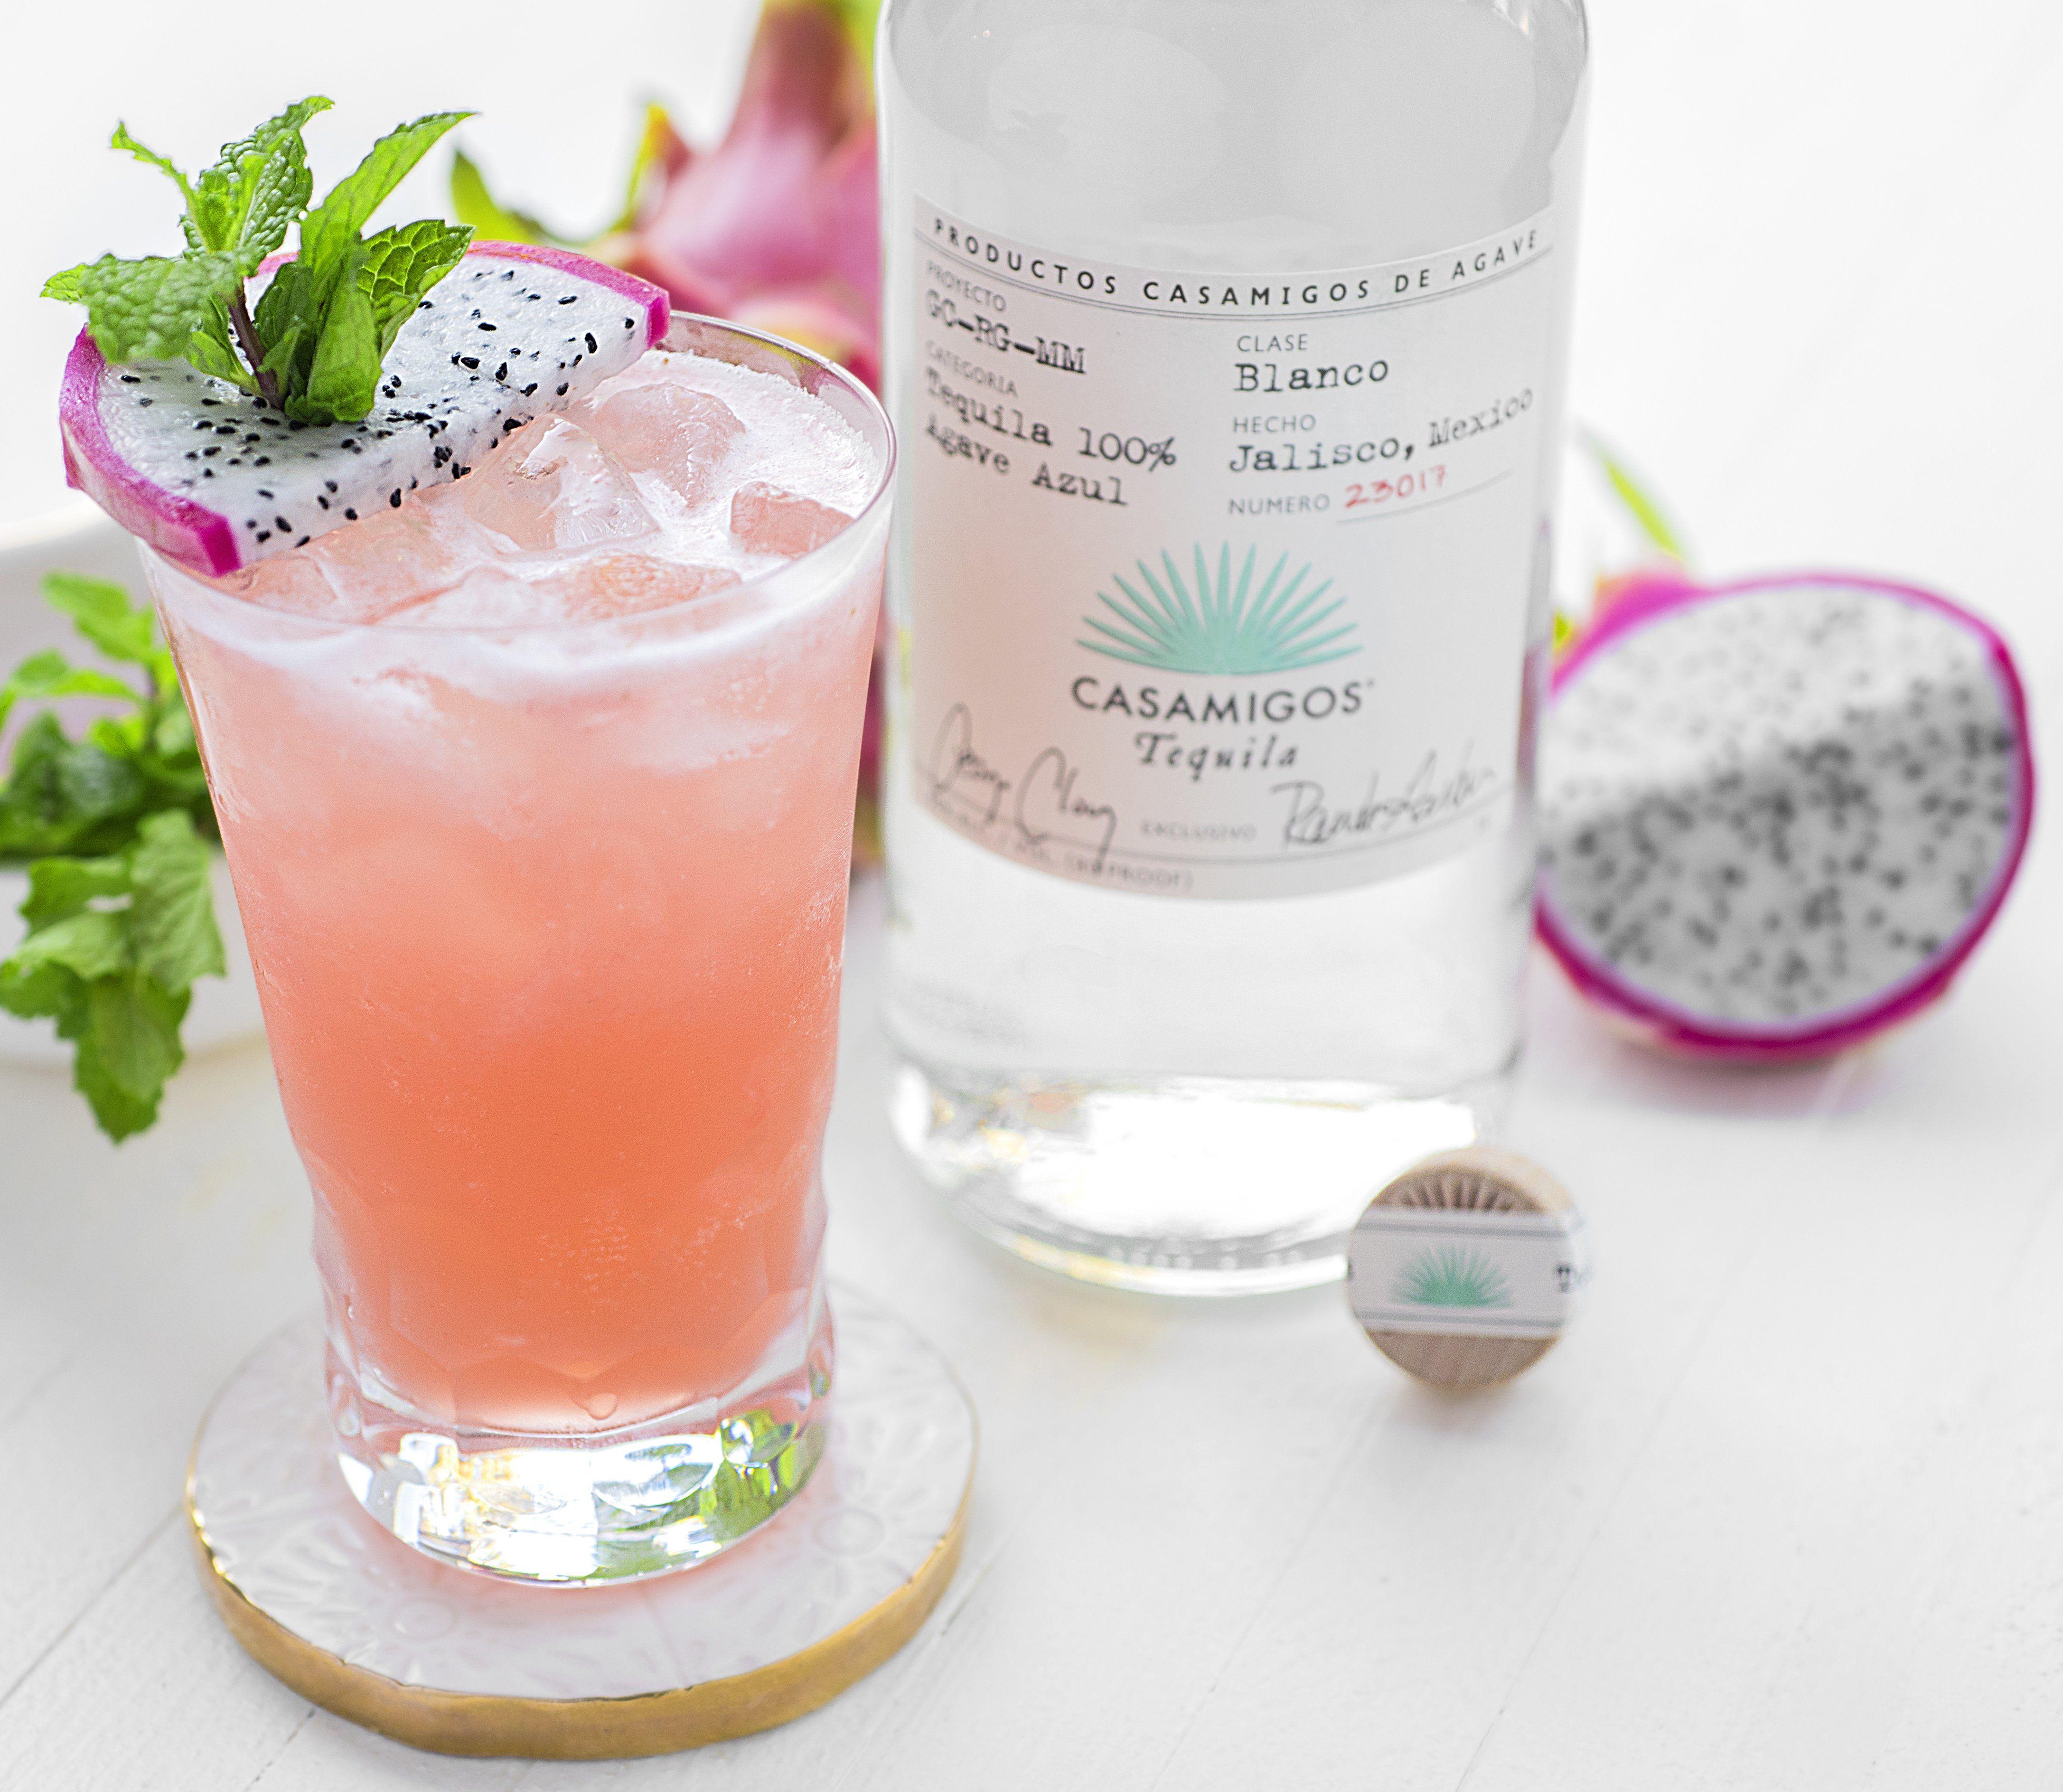 The Casamigos Pink Dragon Lemonade